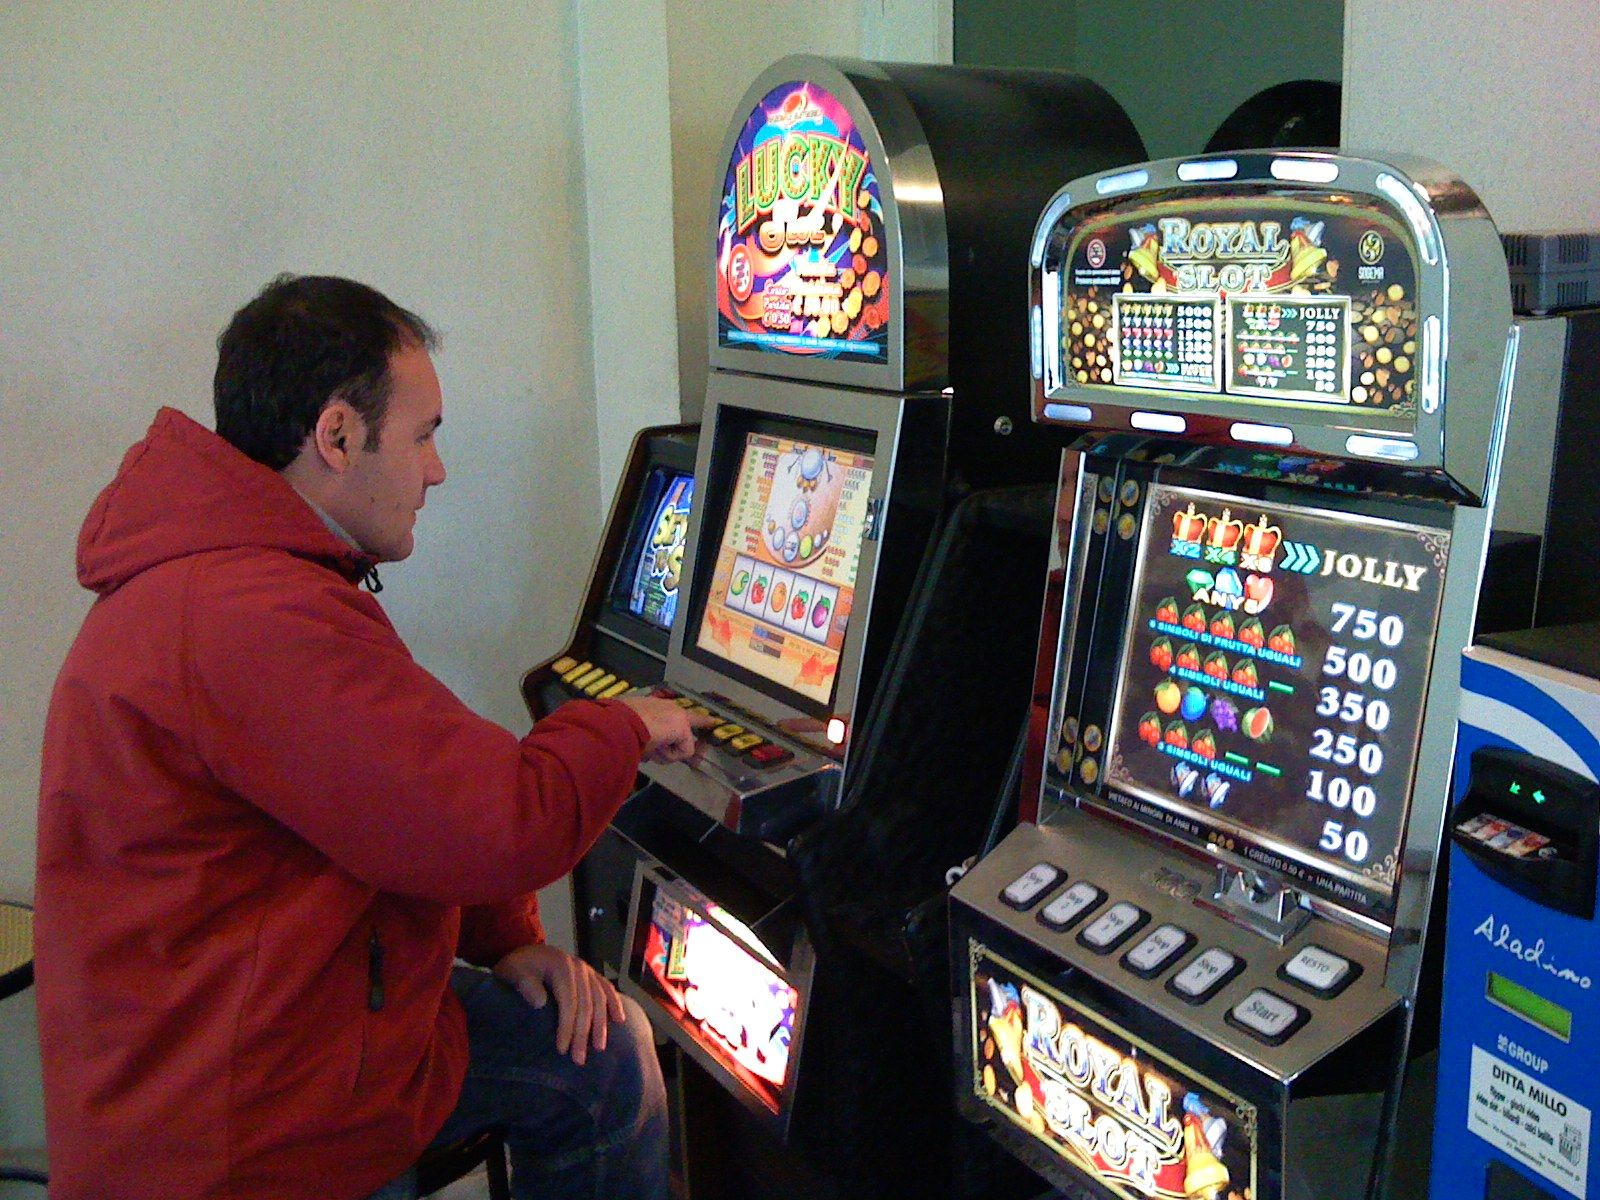 Цена за лицензию на игровые автоматы игровые автоматы бесплатно горажи